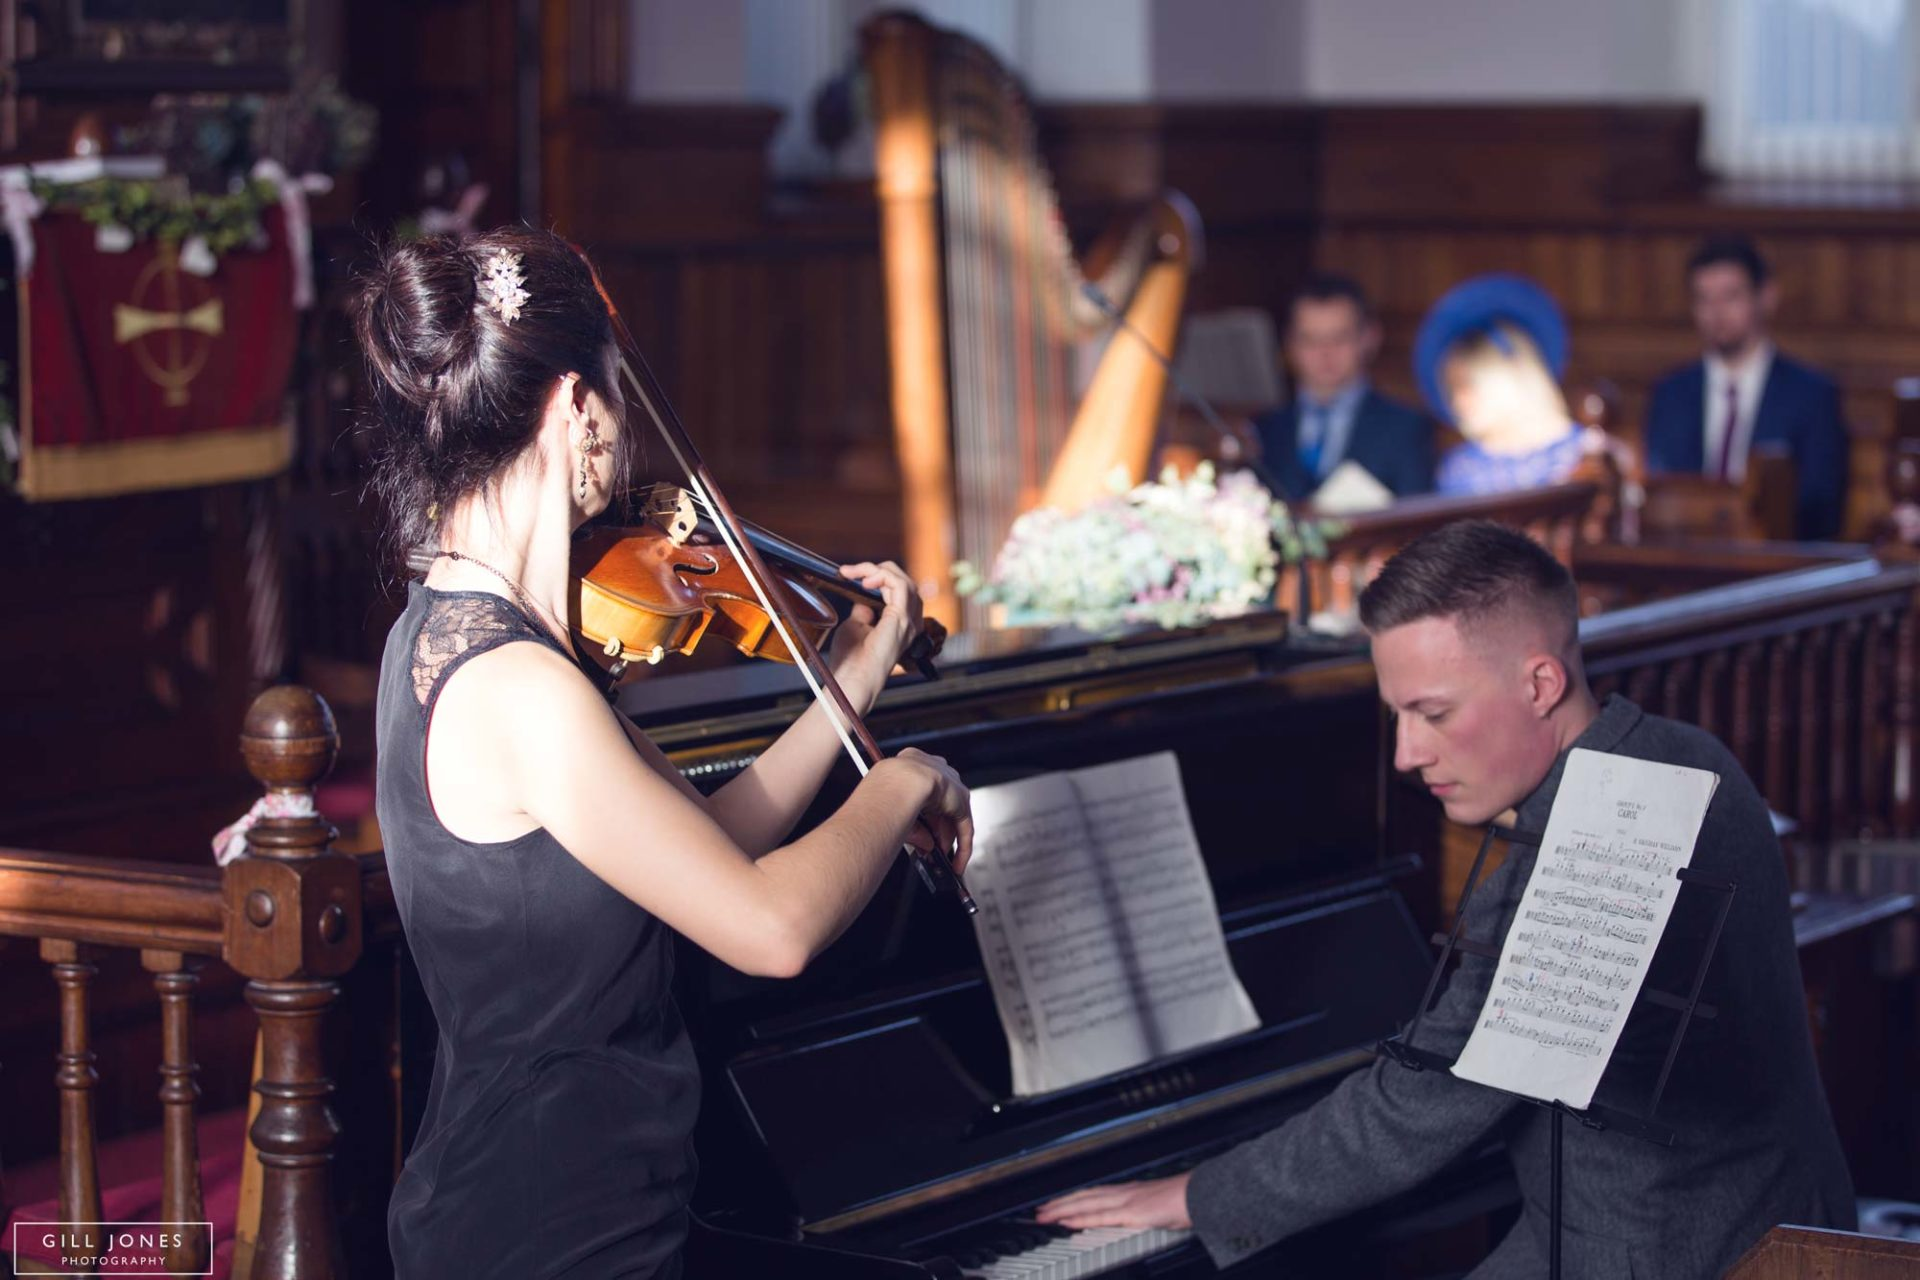 a violinist plays